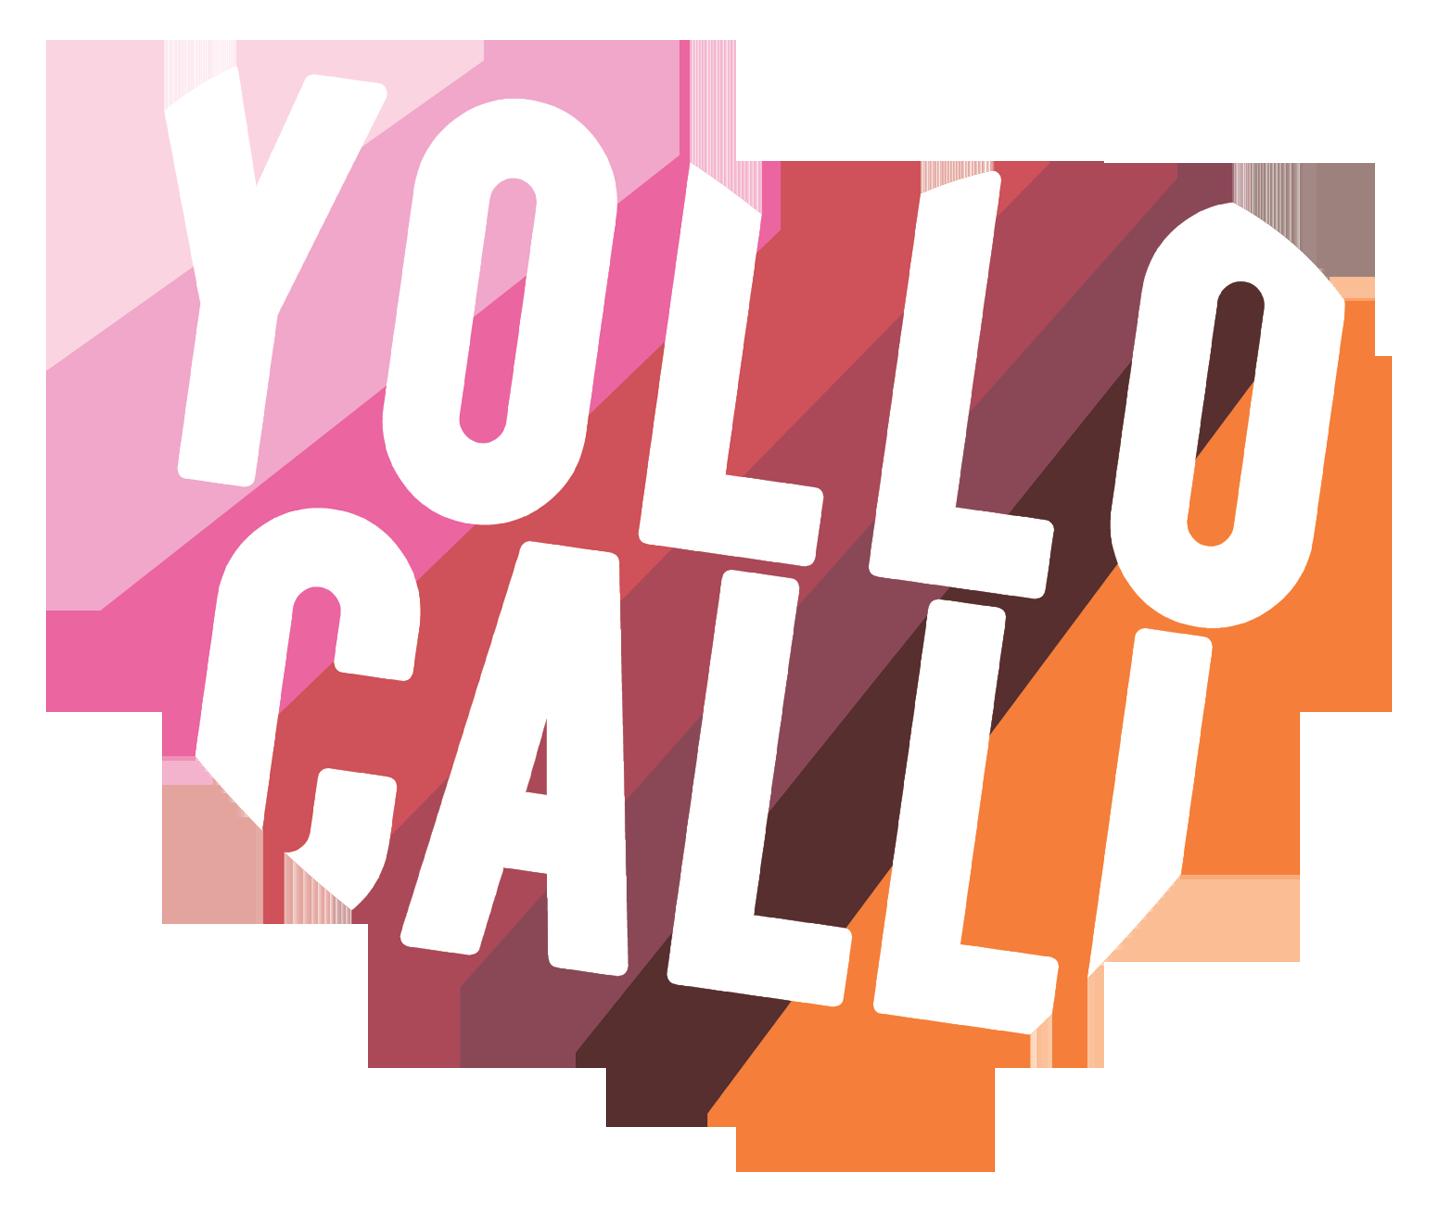 Copy of YOLLO-LOGO-ILLUST.png